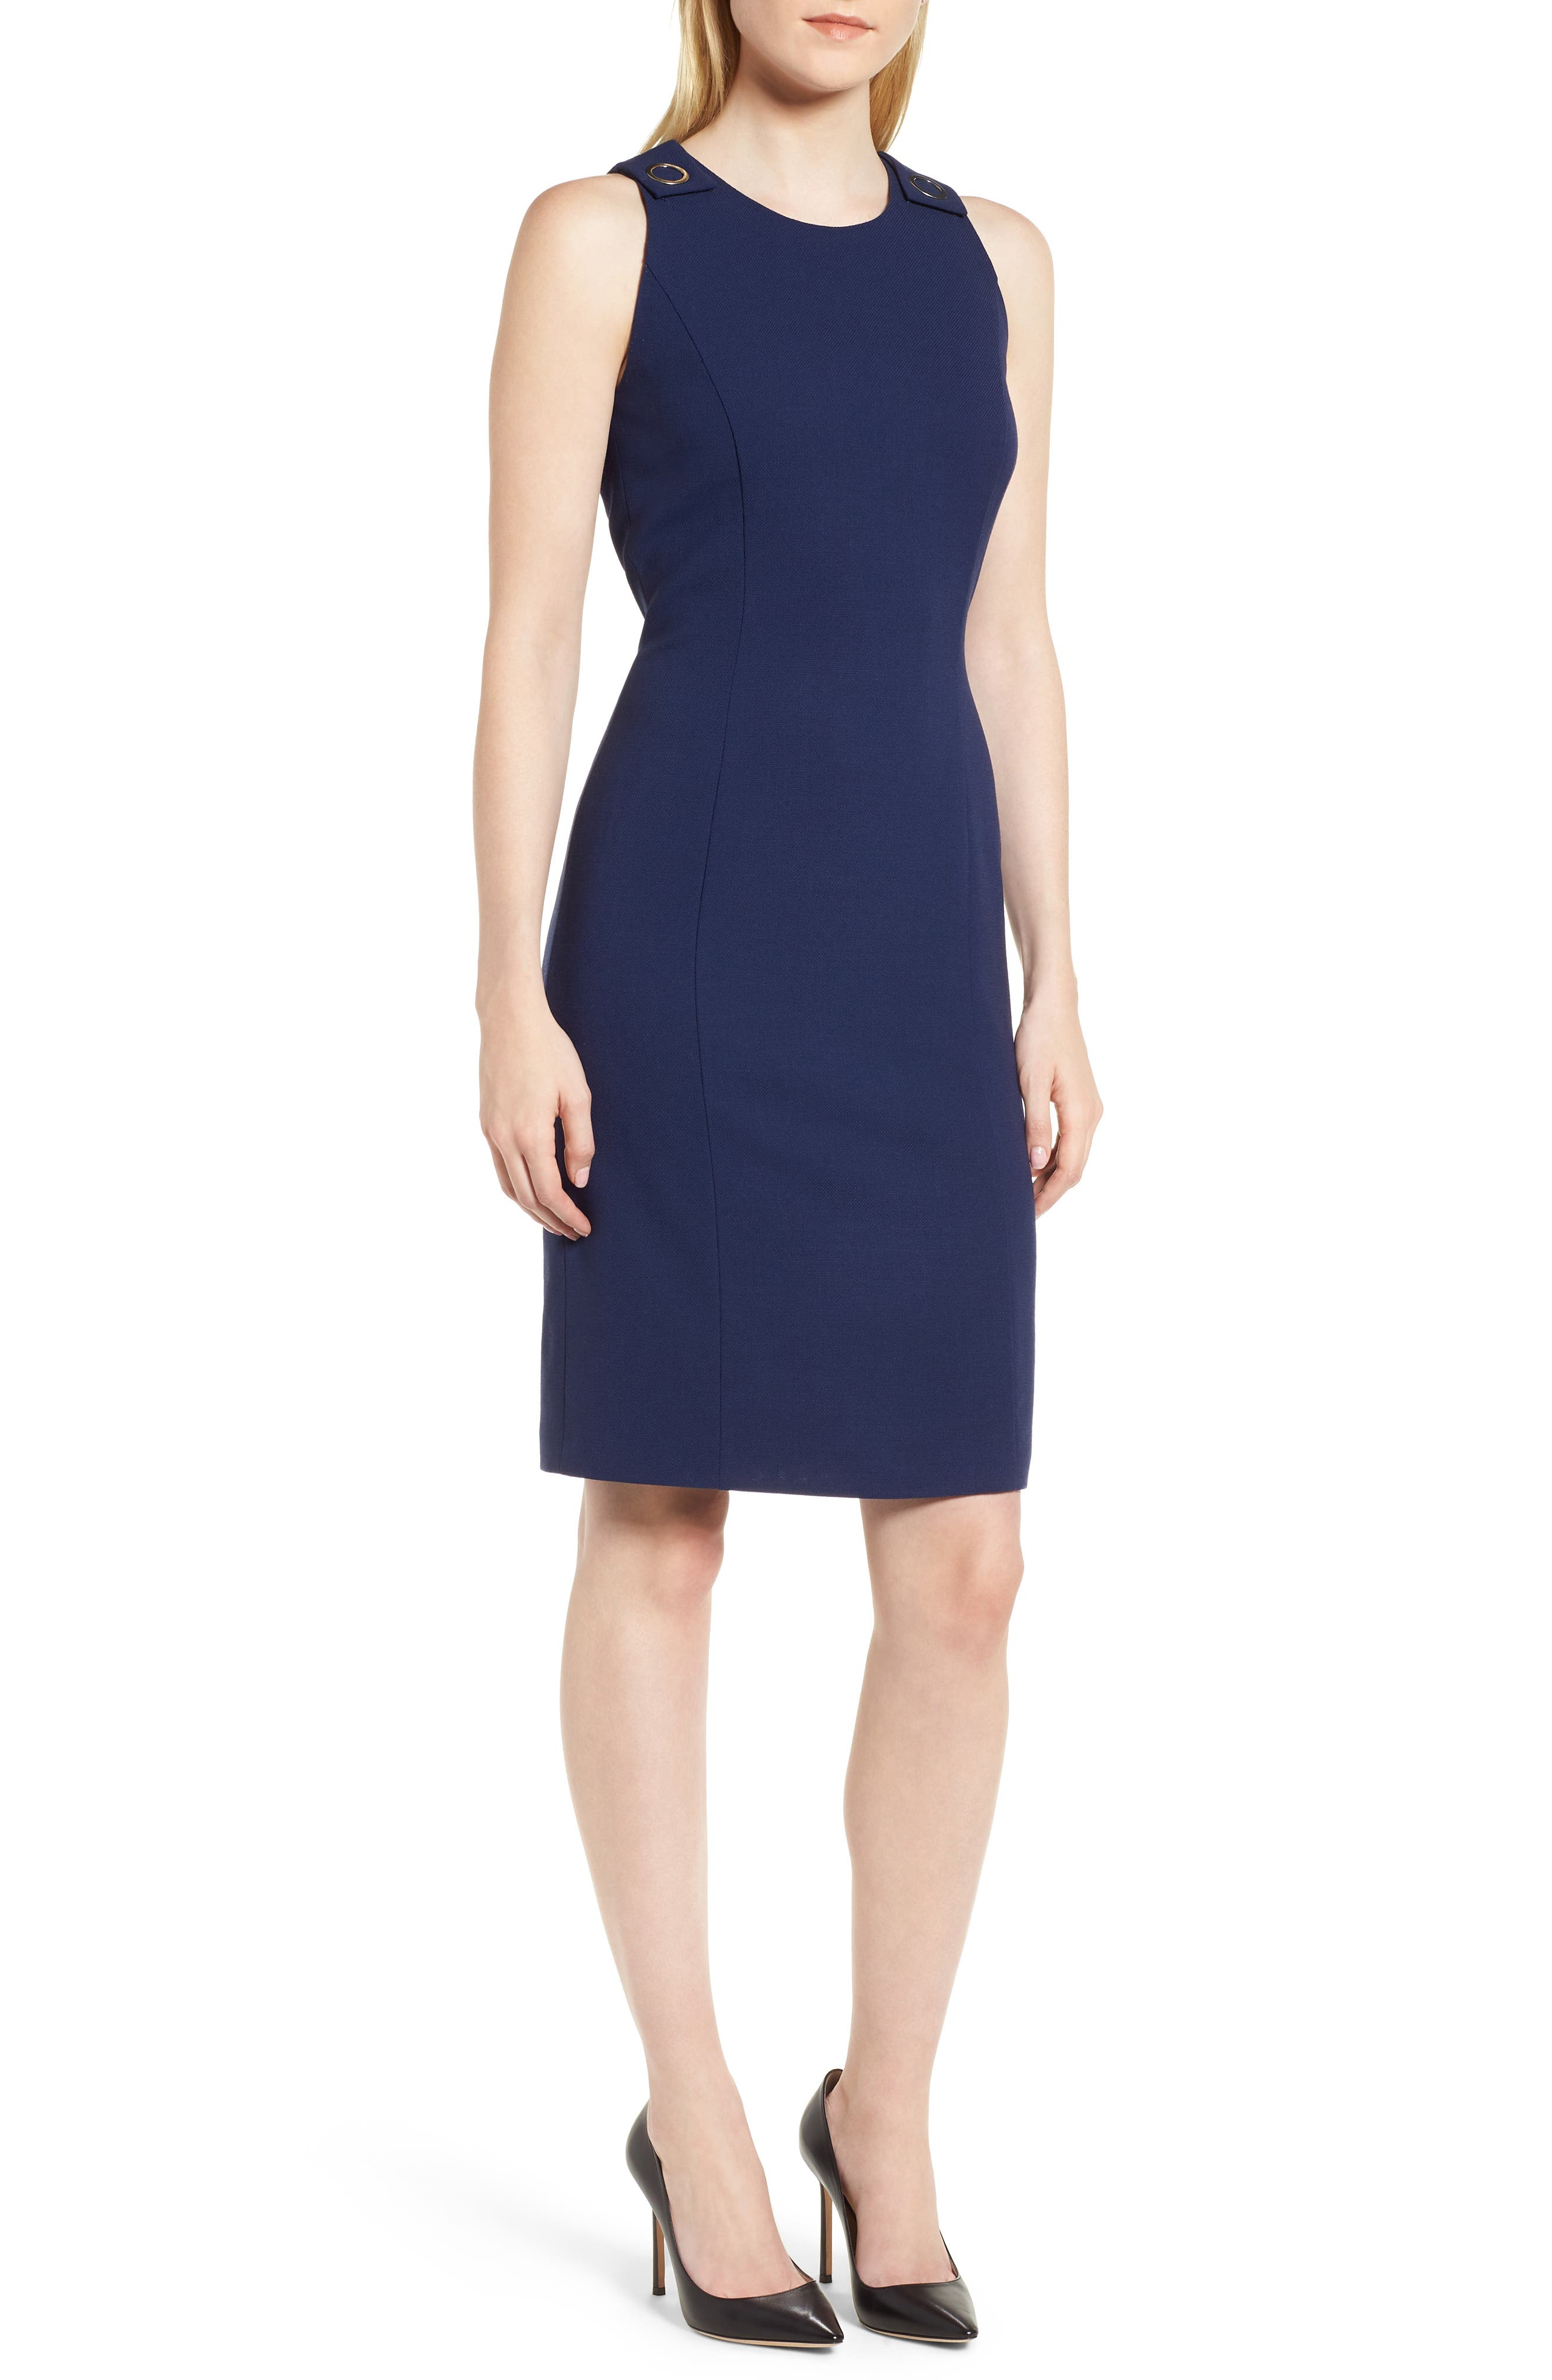 Dibalena Texture Stretch Dress,                             Main thumbnail 1, color,                             425